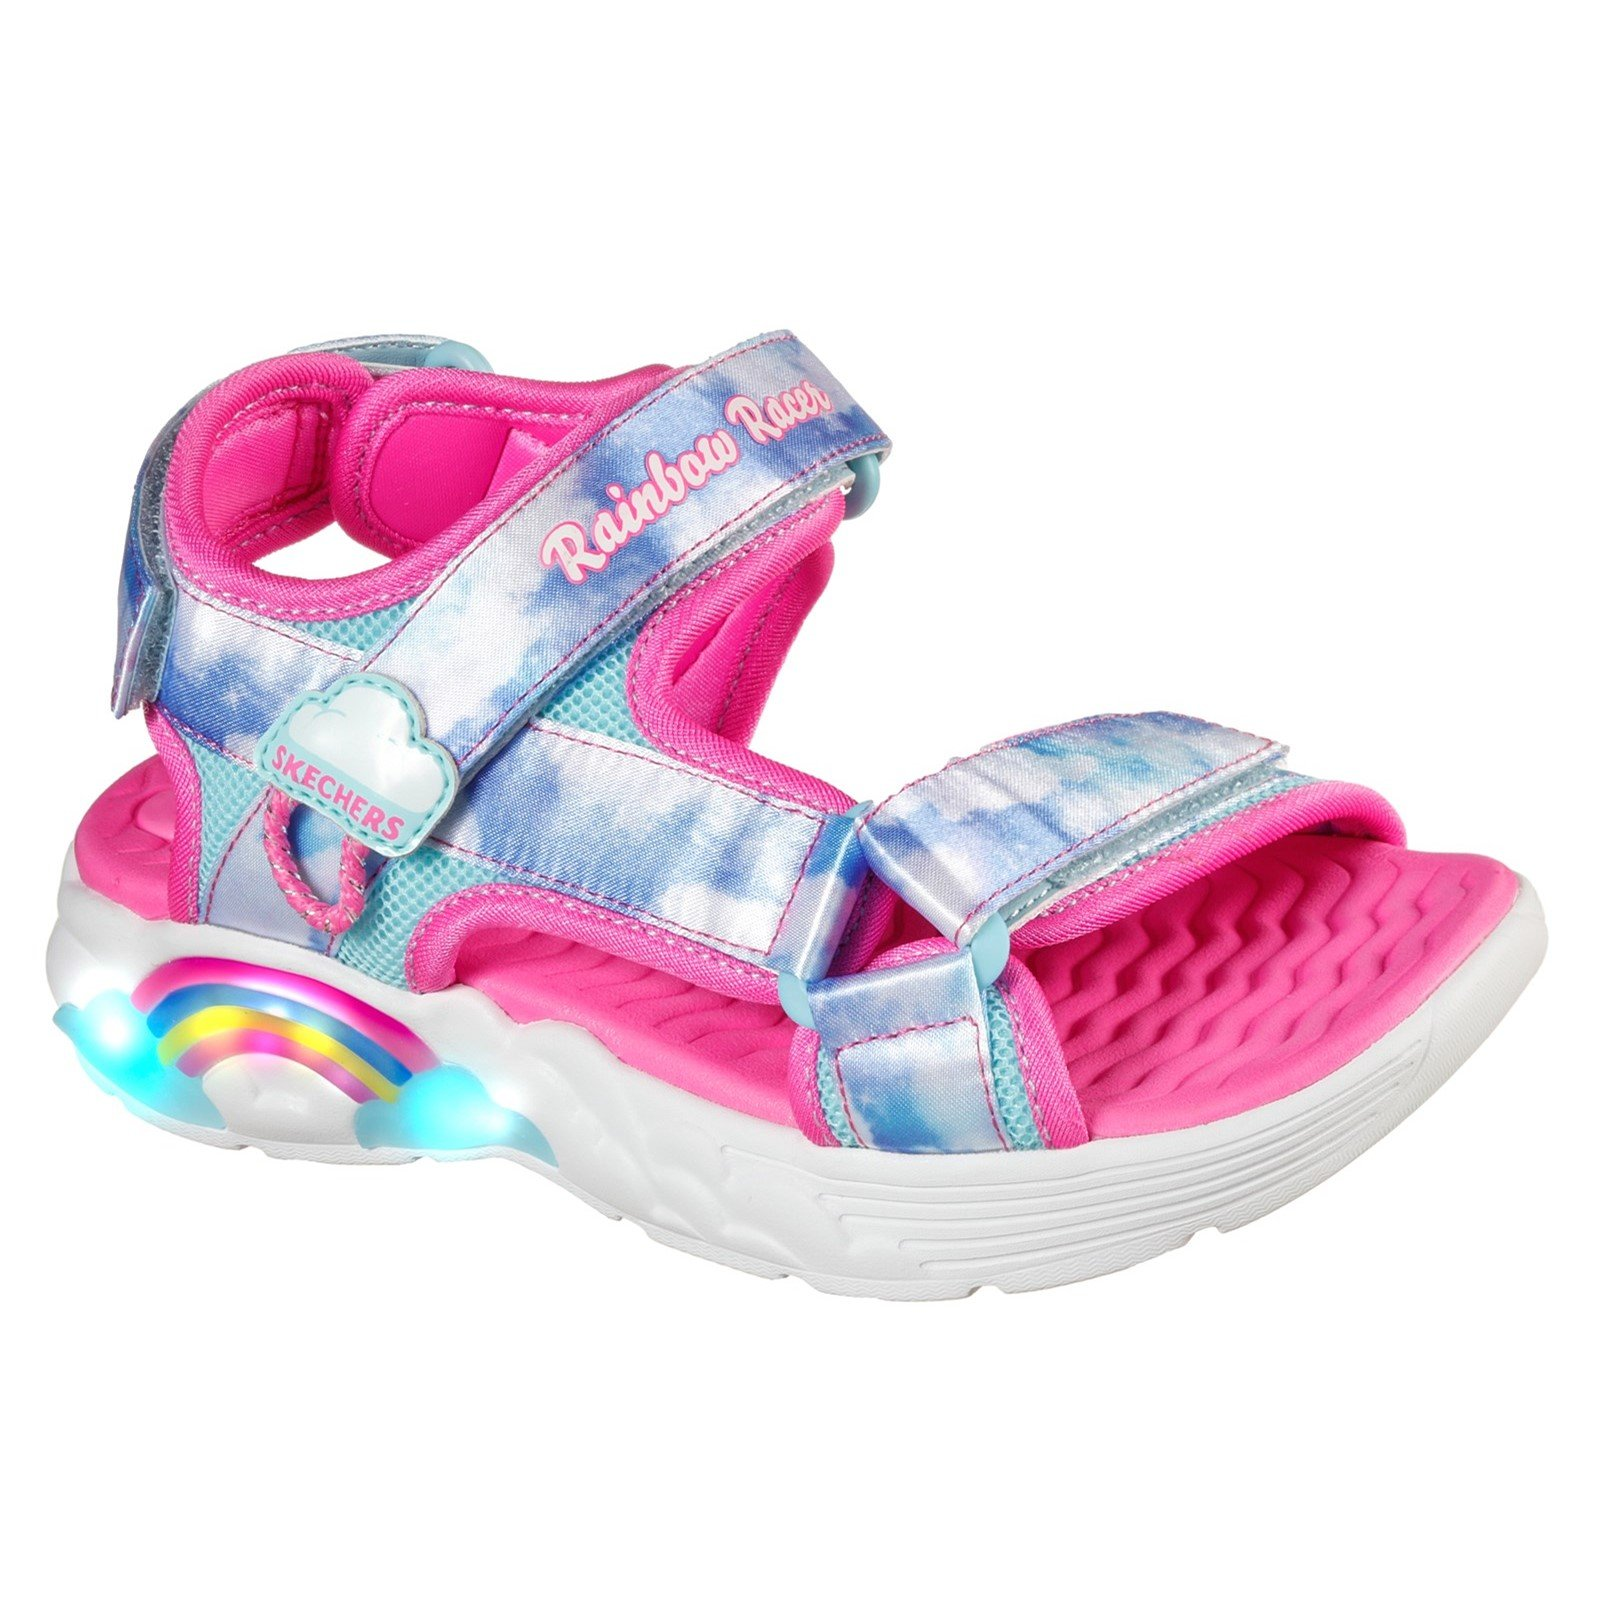 Skechers Unisex Rainbow Racer Summer Sky Beach Sandals Multicolor 32096 - Pink/Blue Textile 13.5